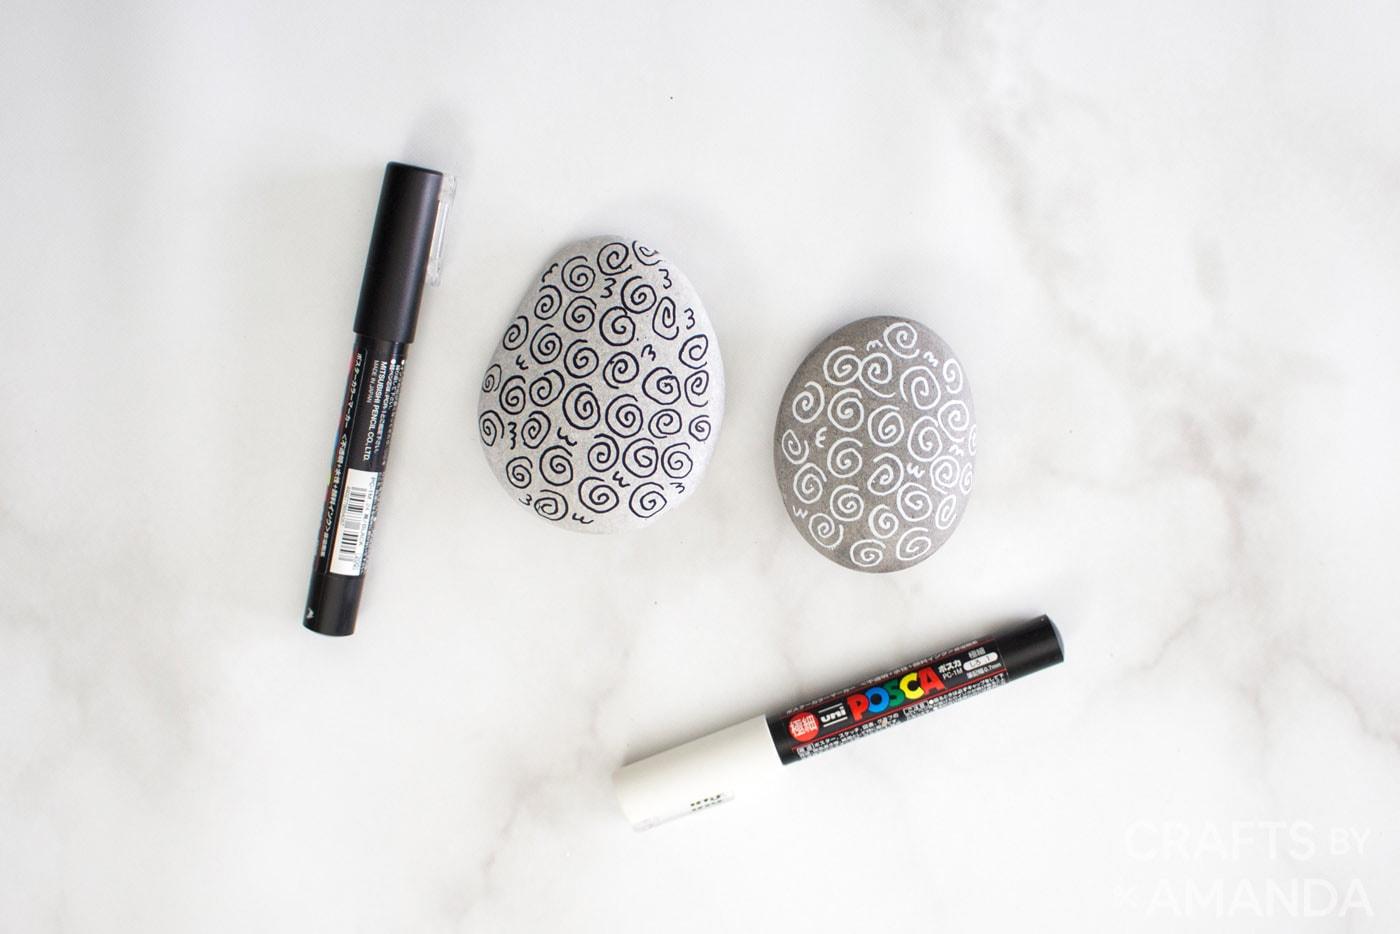 spirals drawn on rocks using a paint pen